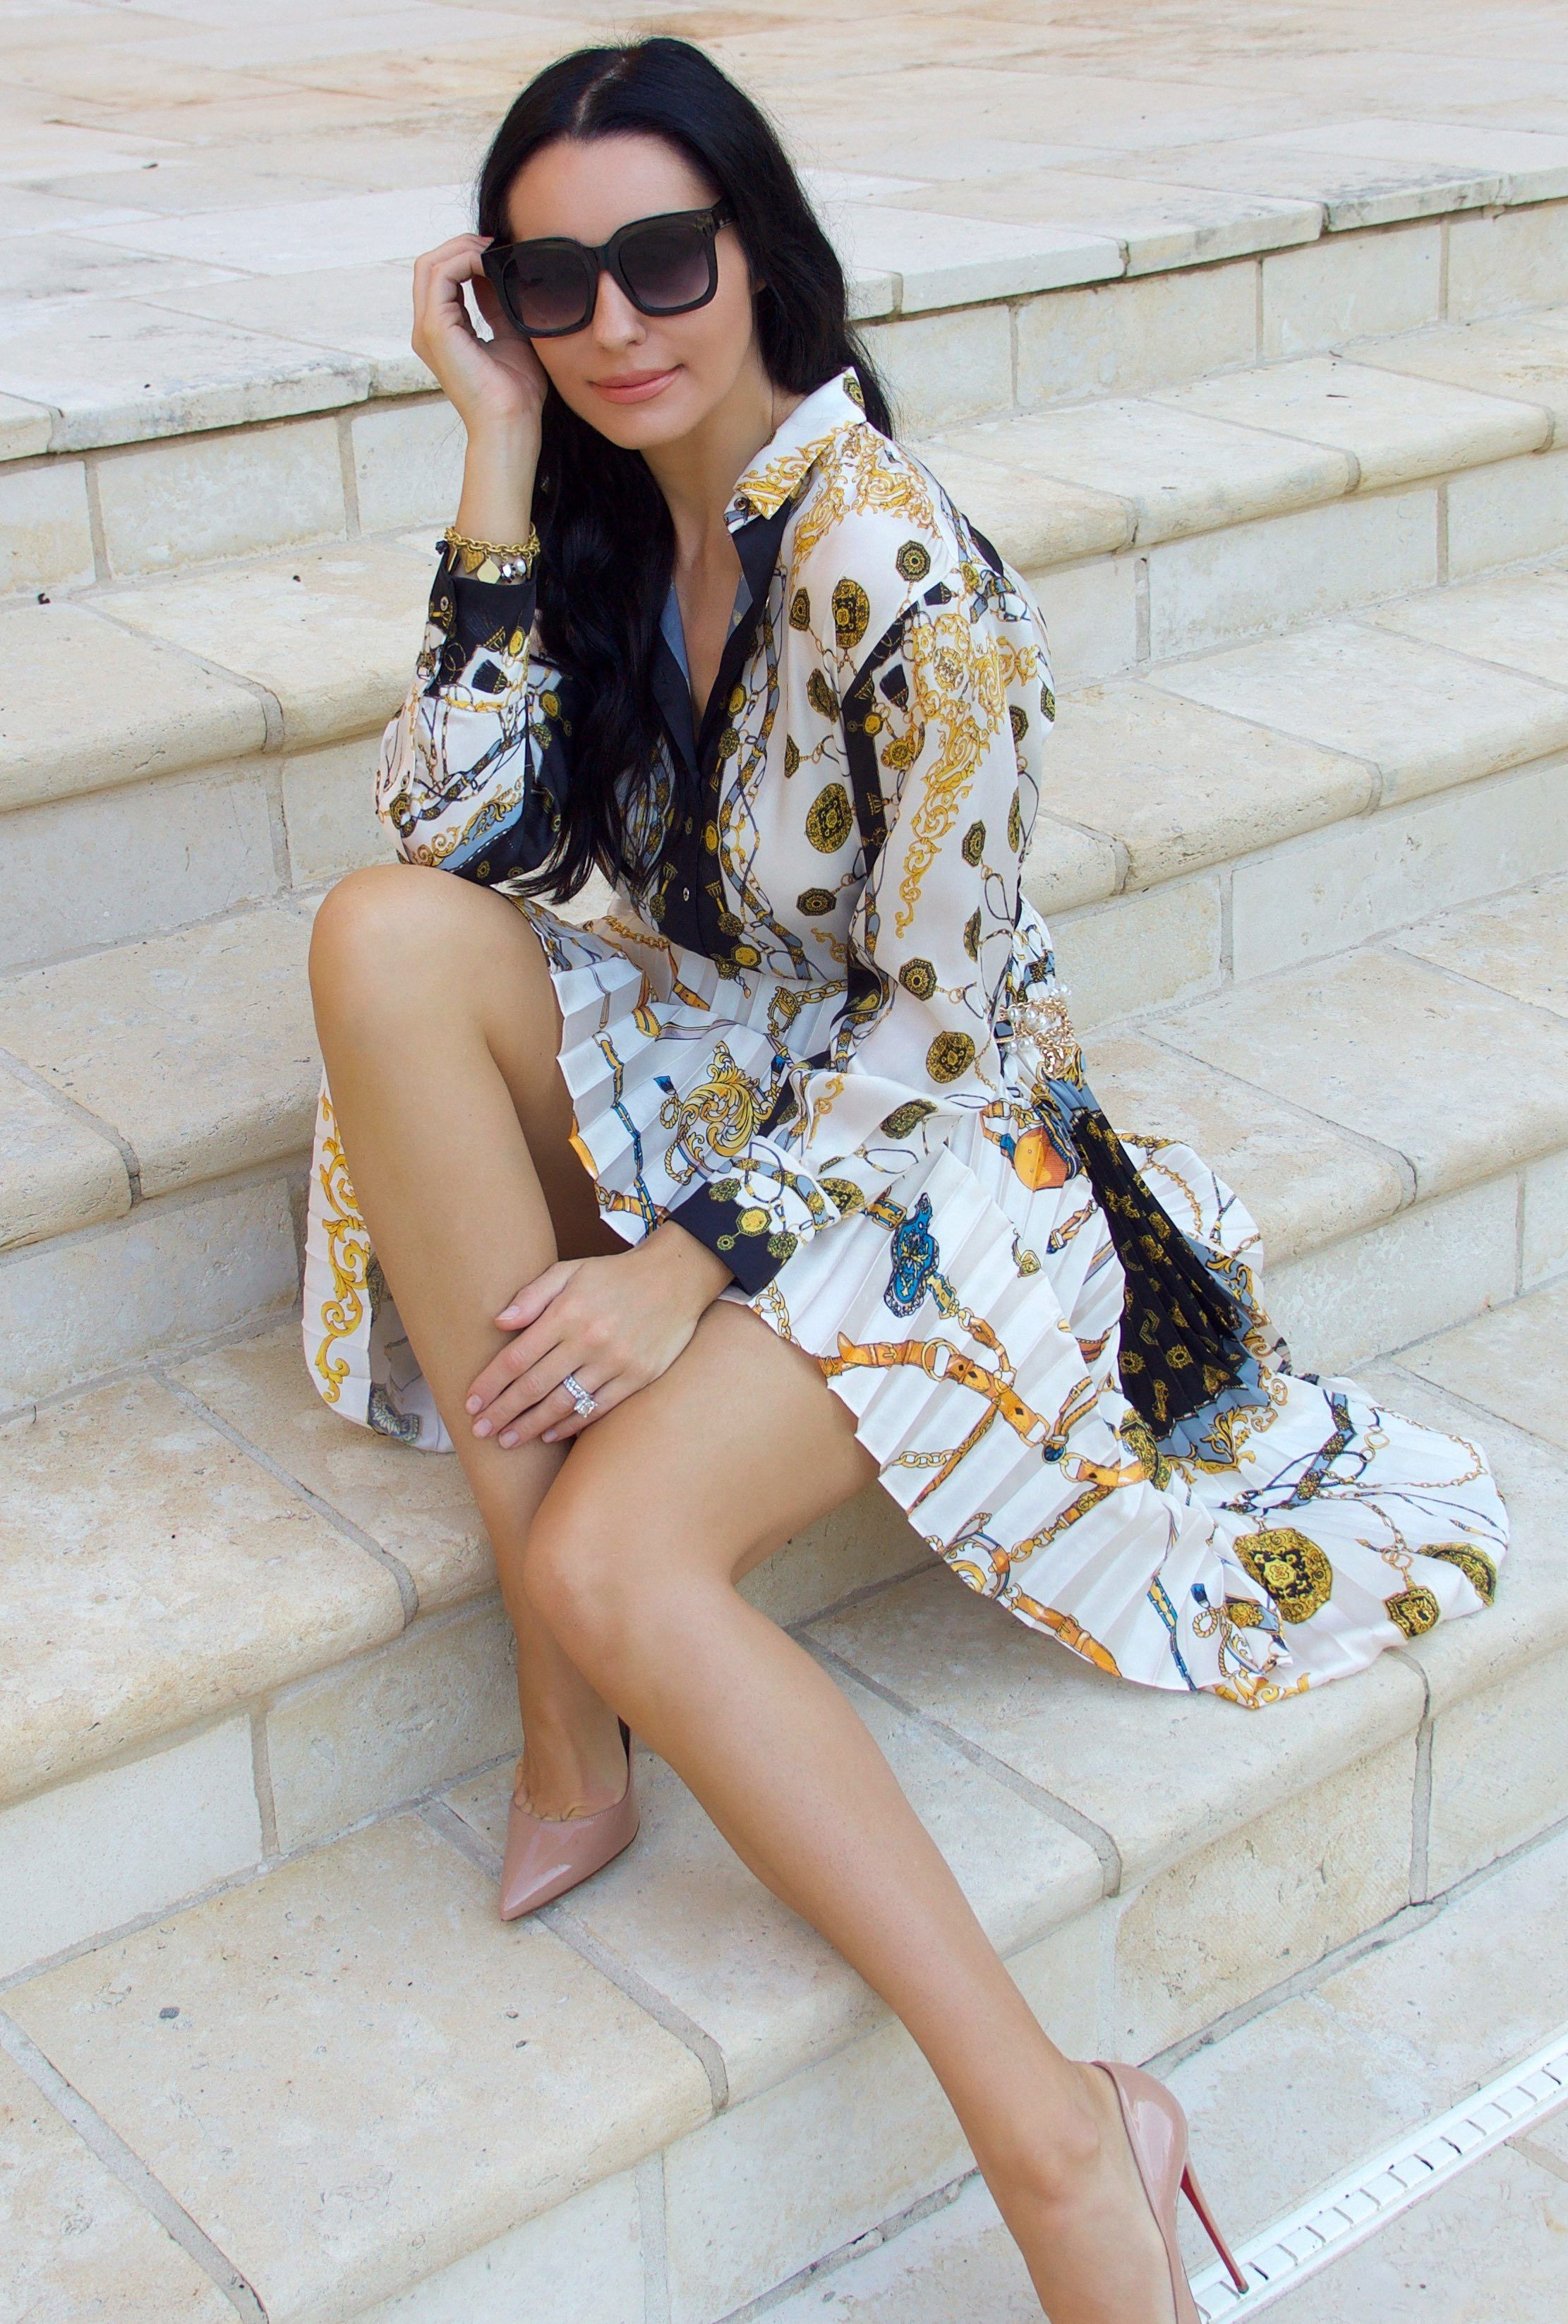 080867eea Zara, Scarf print, ZARA chain print pleated skirt, ZARA chain print shirt,  Scarf print skirt, Scarf print shirt, Louboutins, Statement outfit,  Workwear, ...